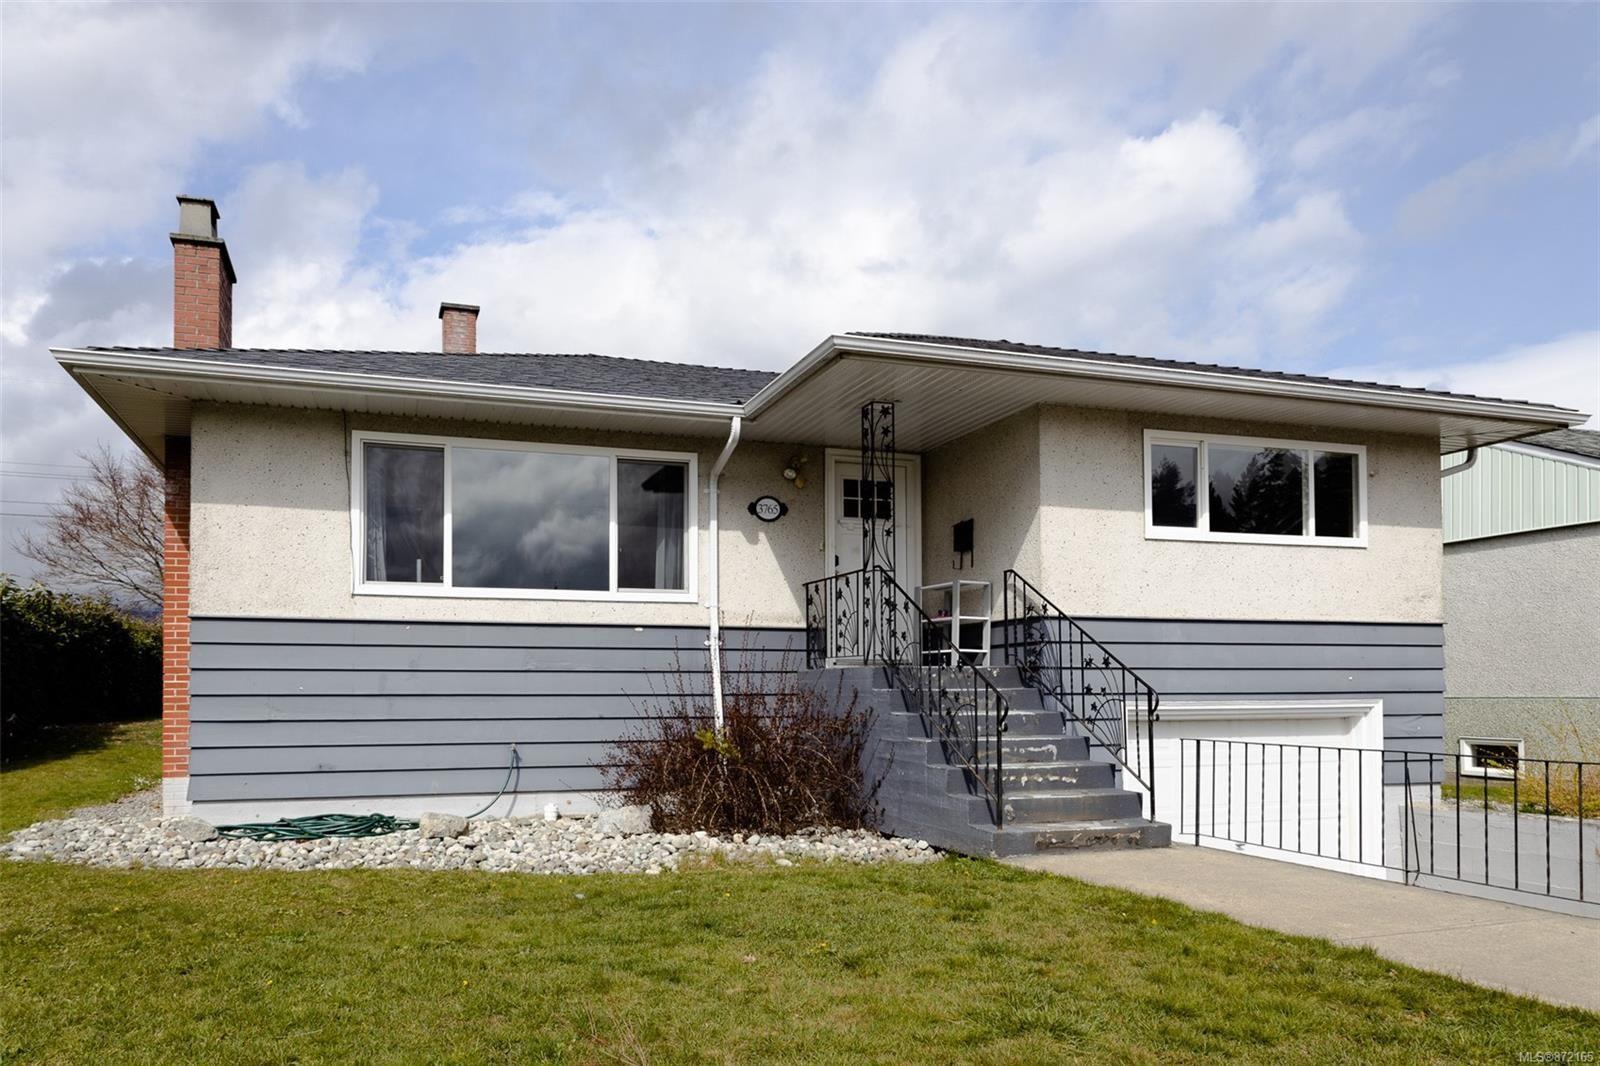 Main Photo: 3765 Waterhouse St in : PA Port Alberni House for sale (Port Alberni)  : MLS®# 872165